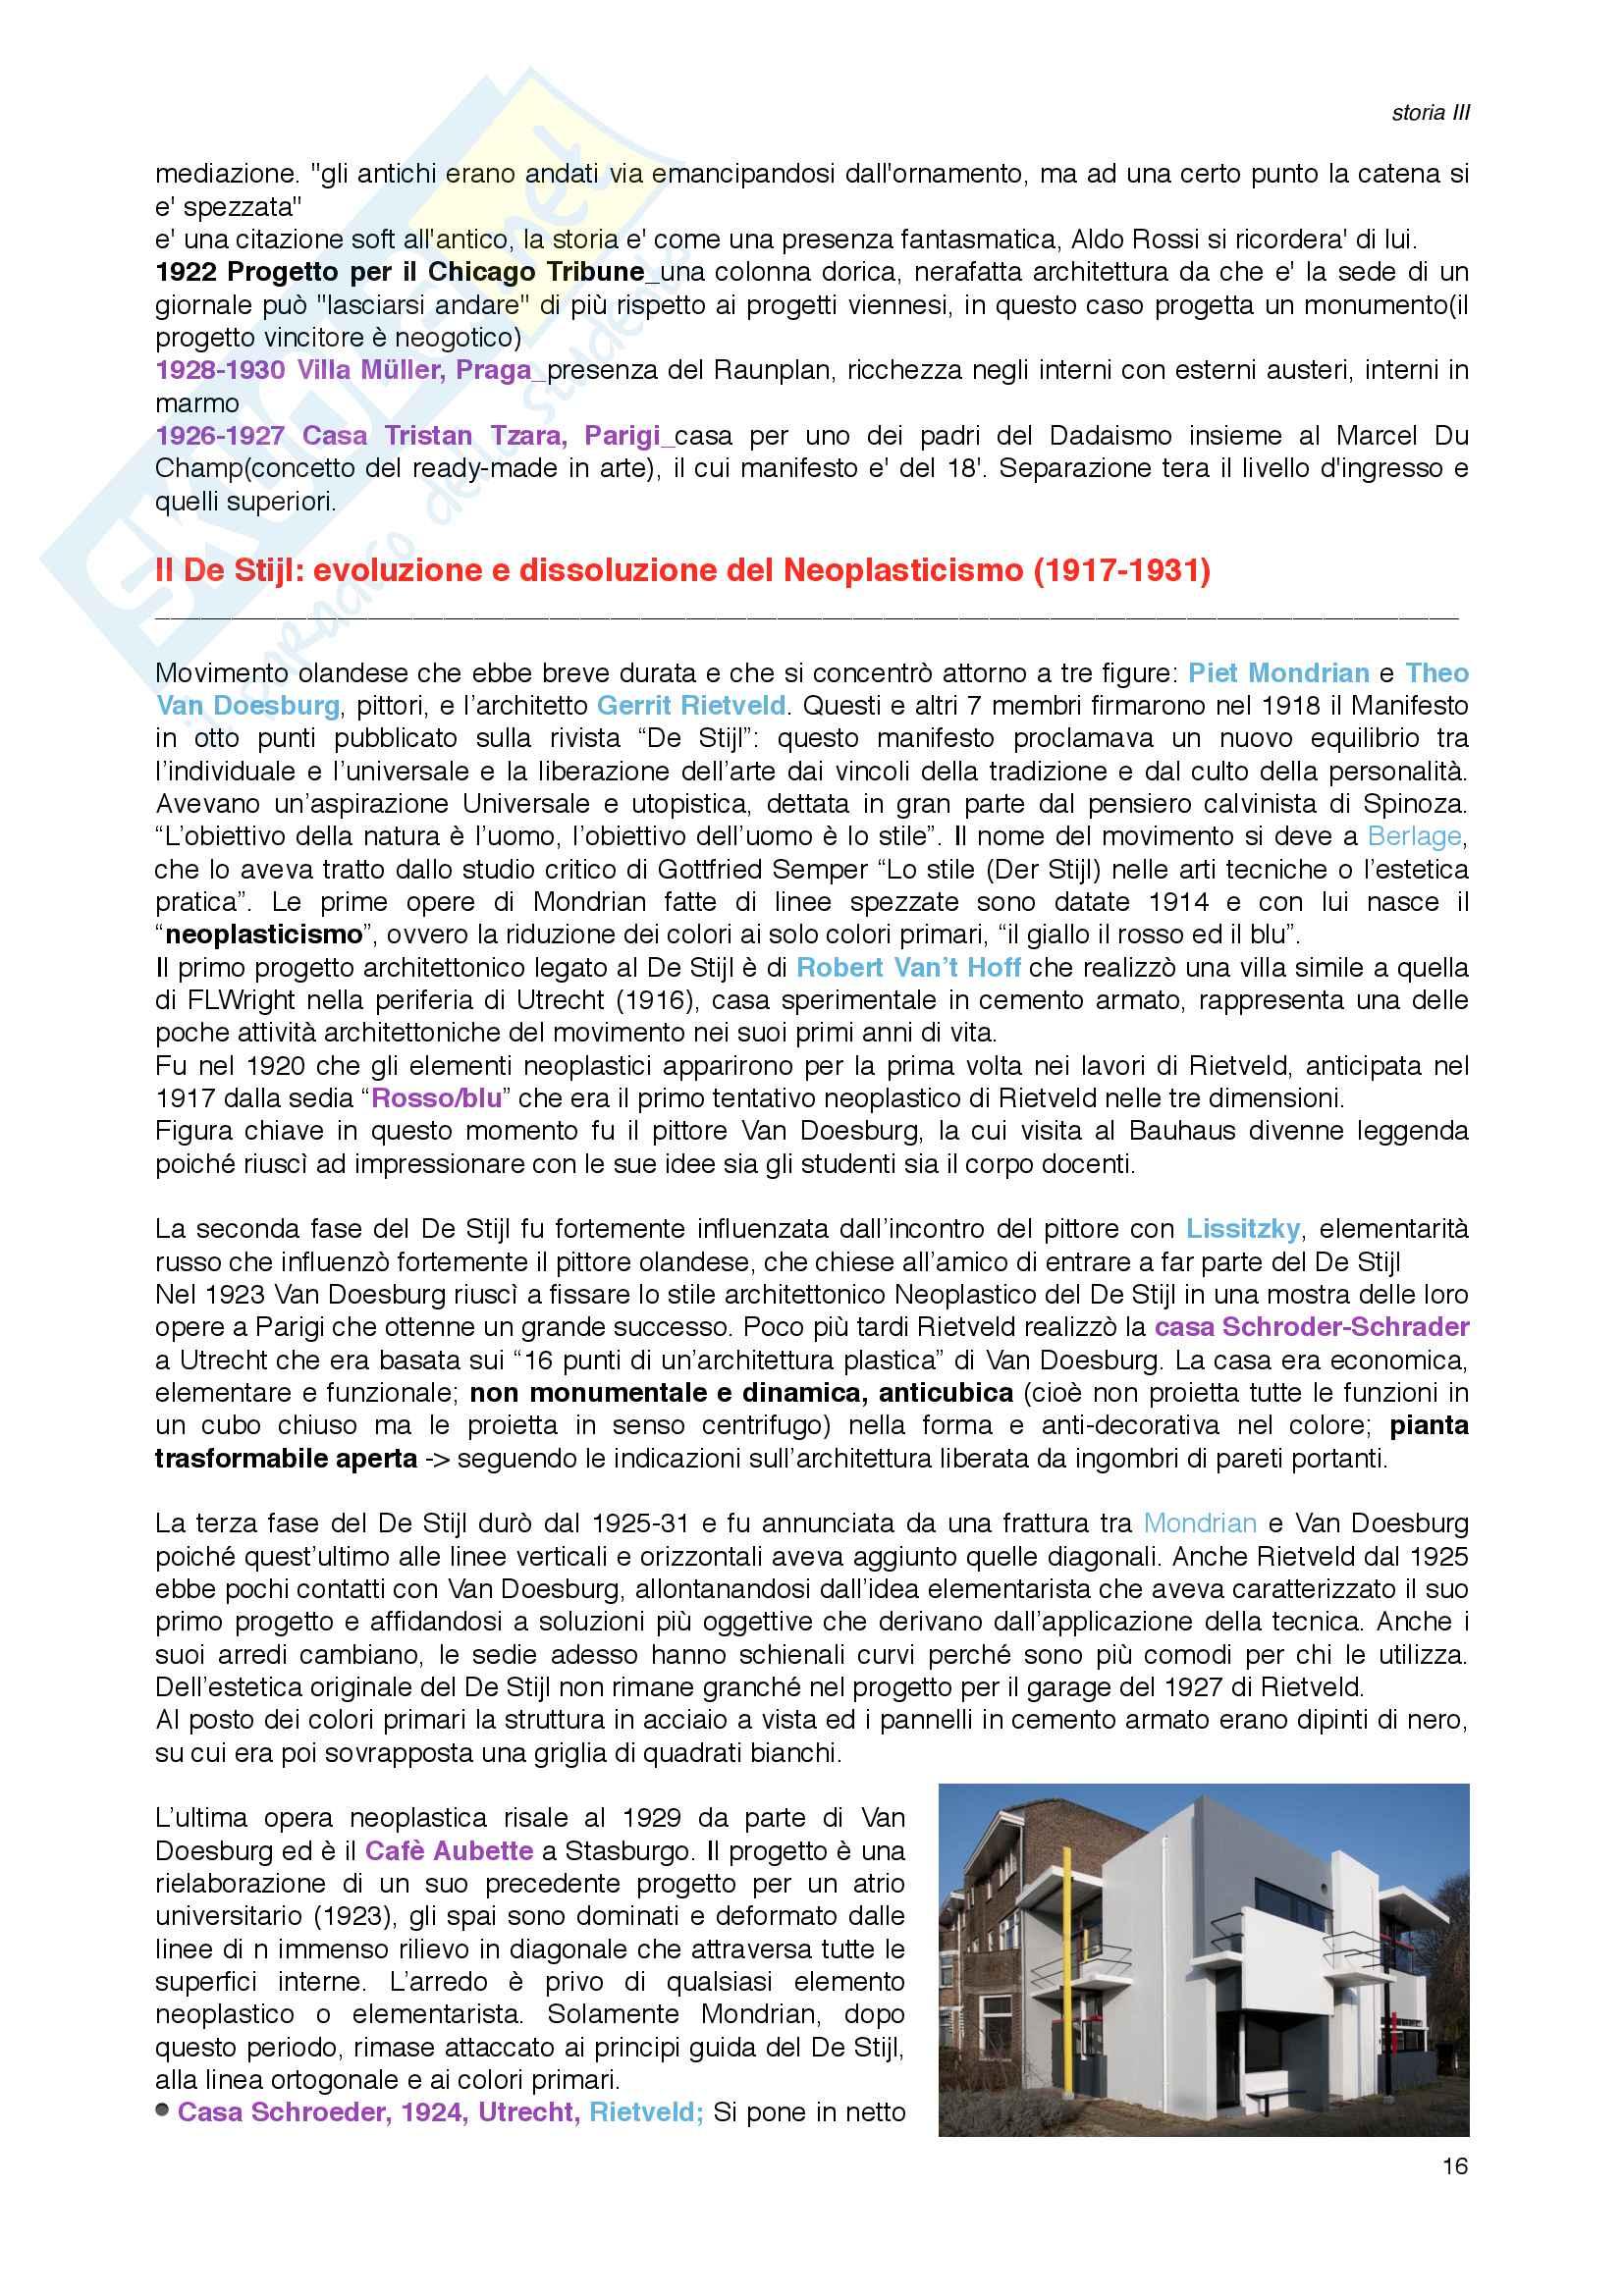 Storia III_Architettura Moderna Pag. 16